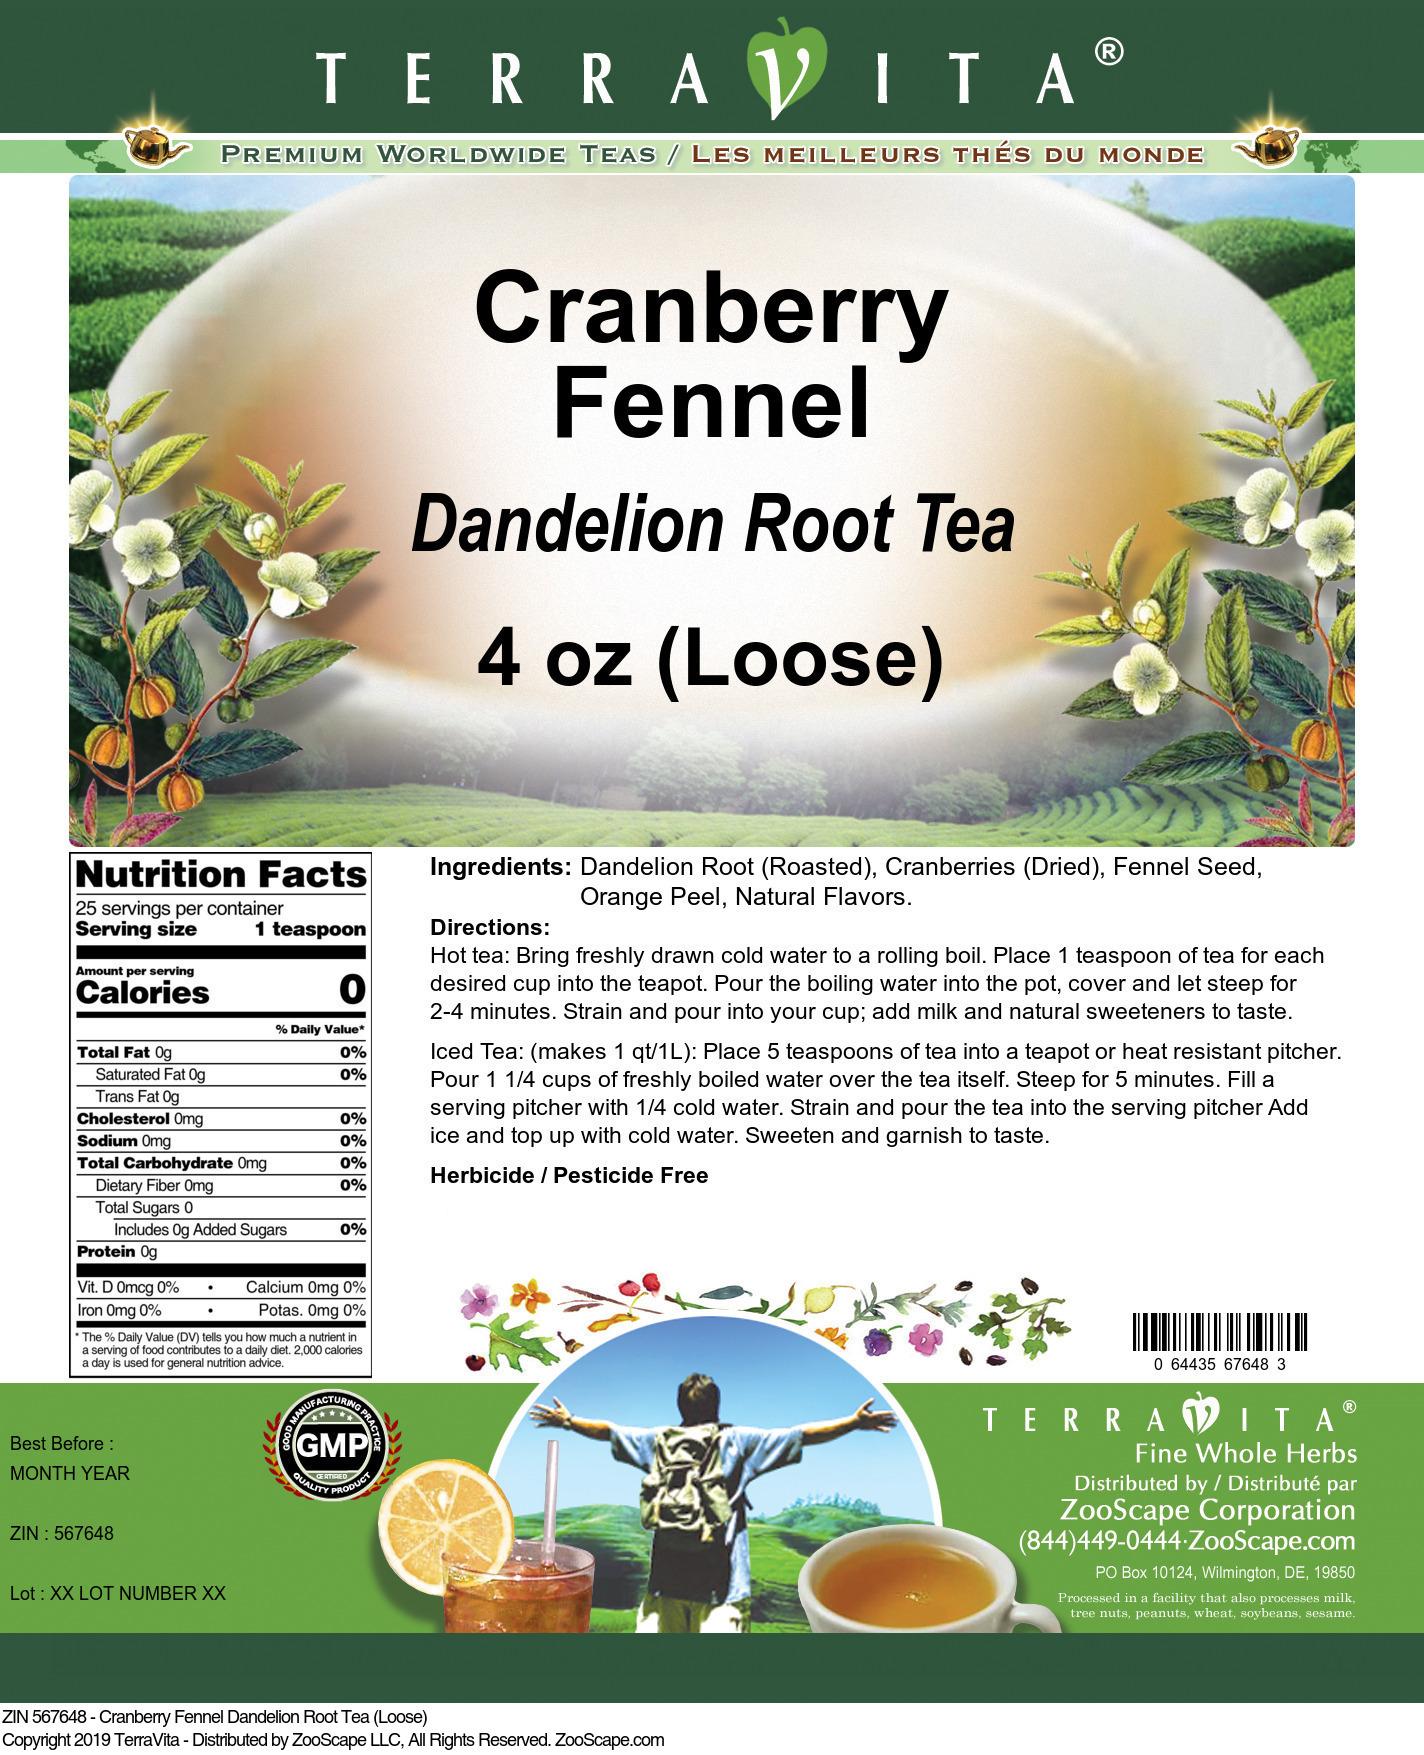 Cranberry Fennel Dandelion Root